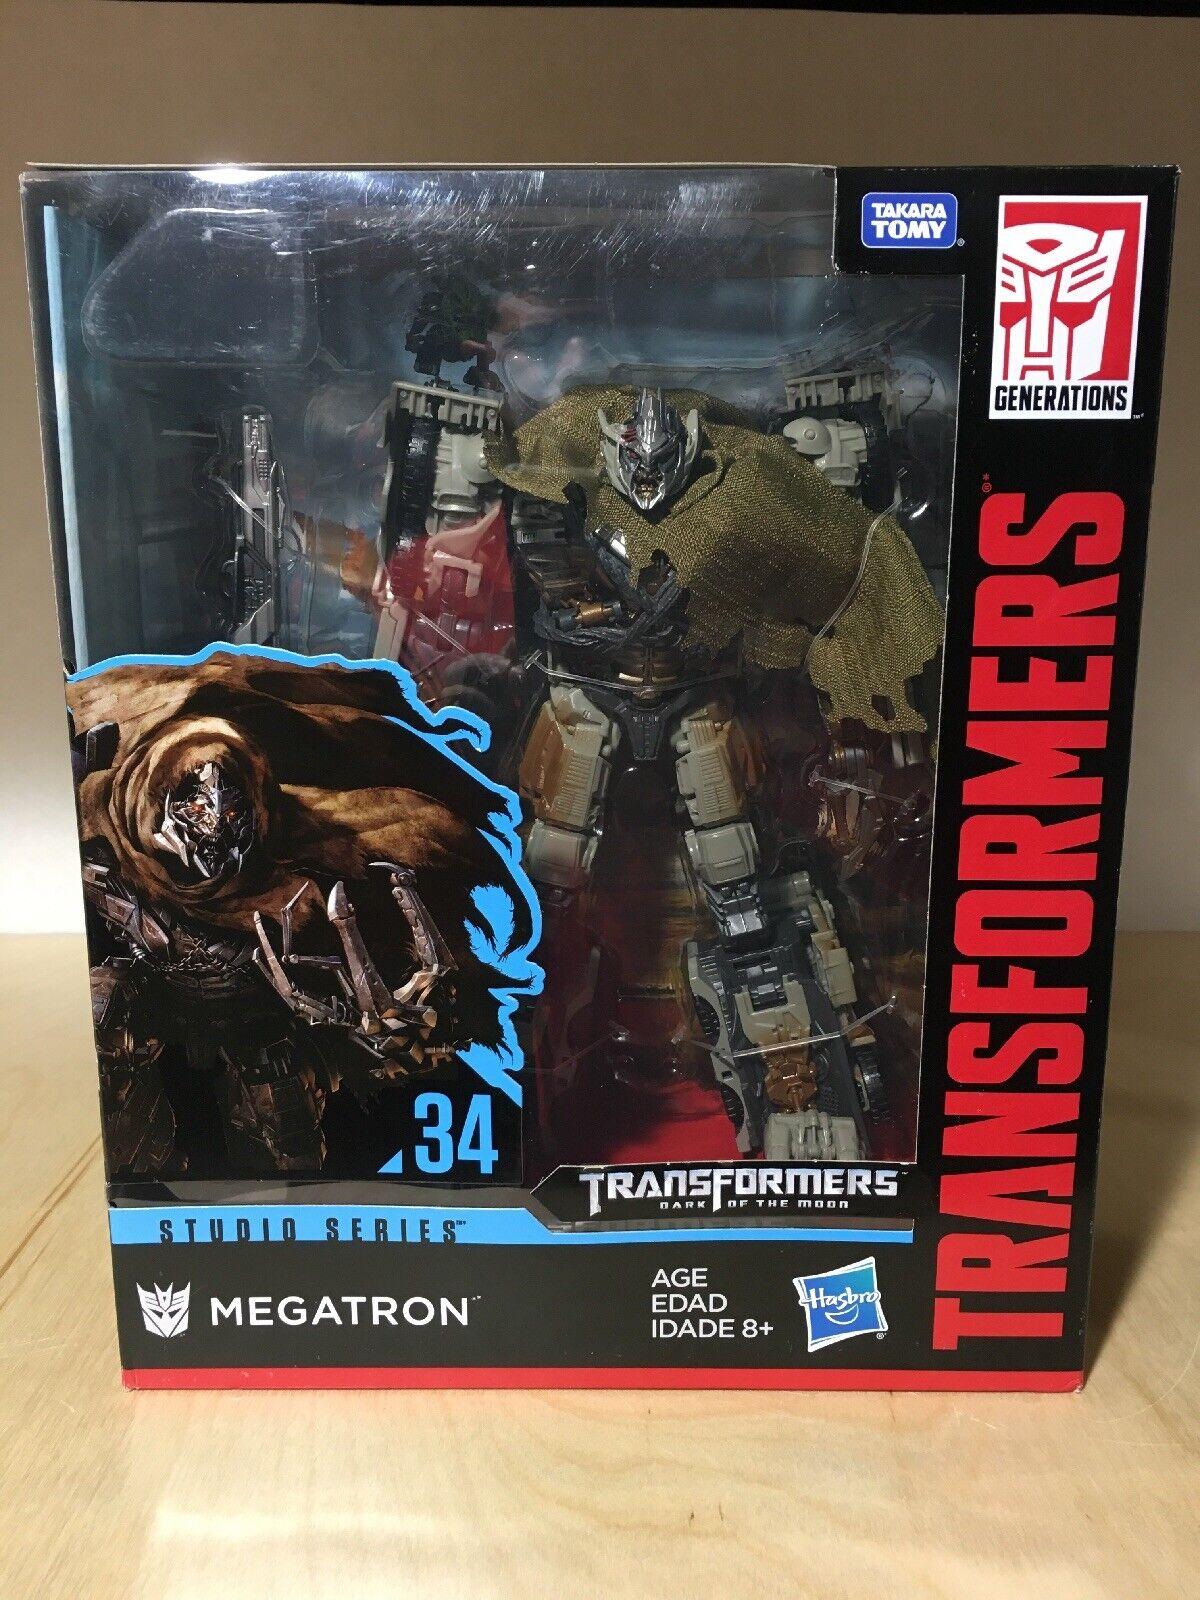 MEGATRON  IGOR Transformers Studio Series 34 Leader classe DOTM 2019  IN STOCK